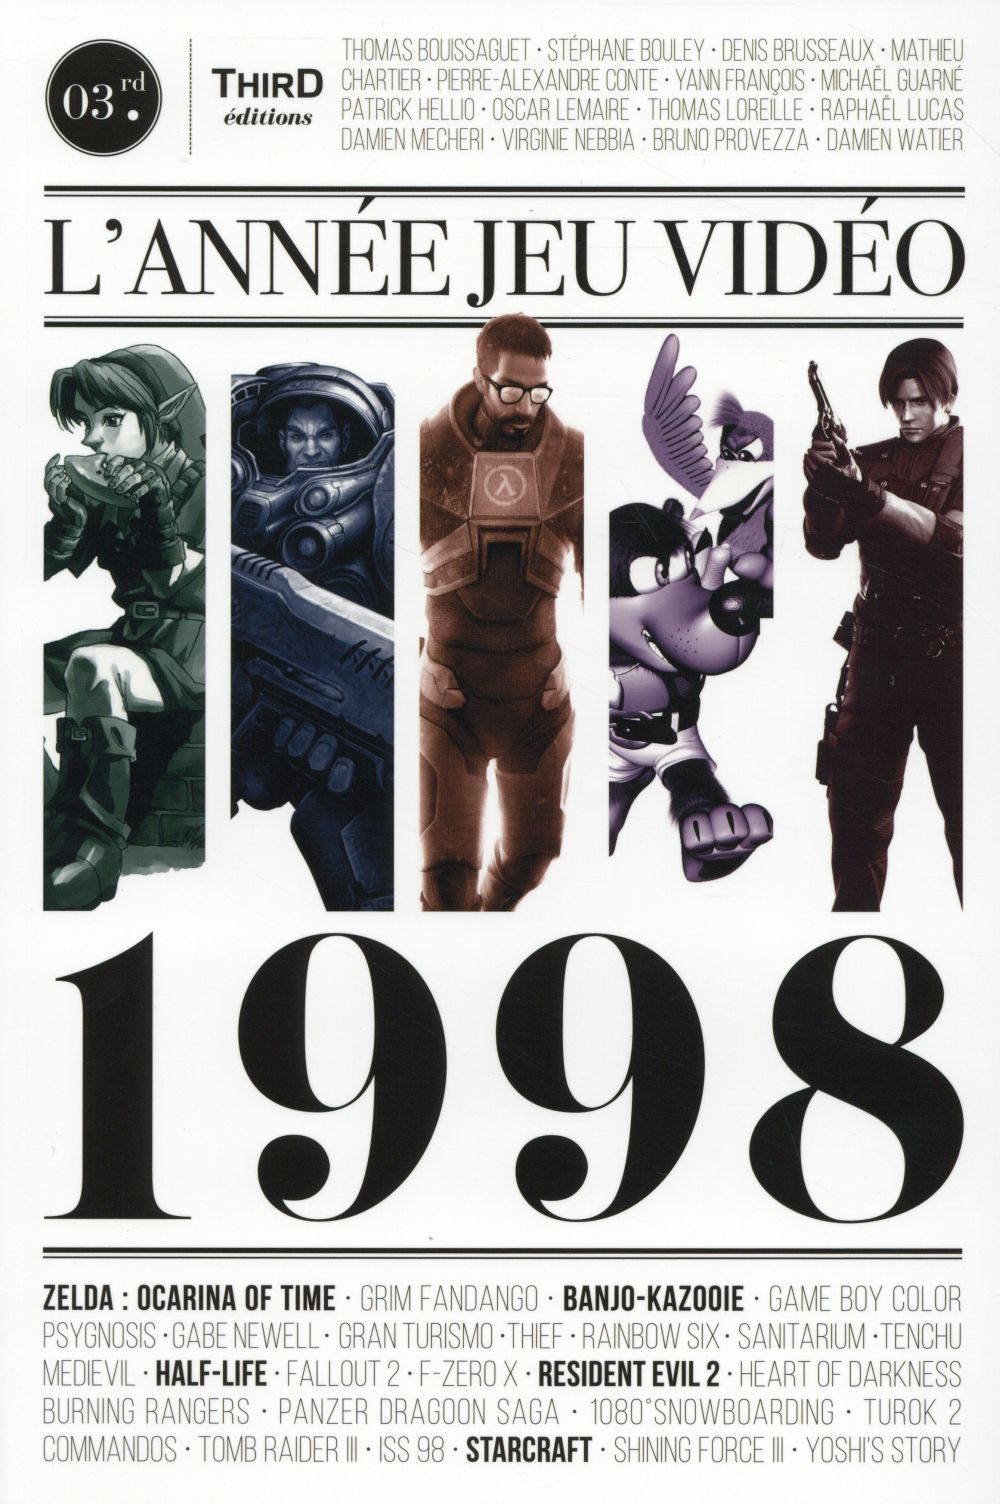 L ANNEE JEU VIDEO 1998